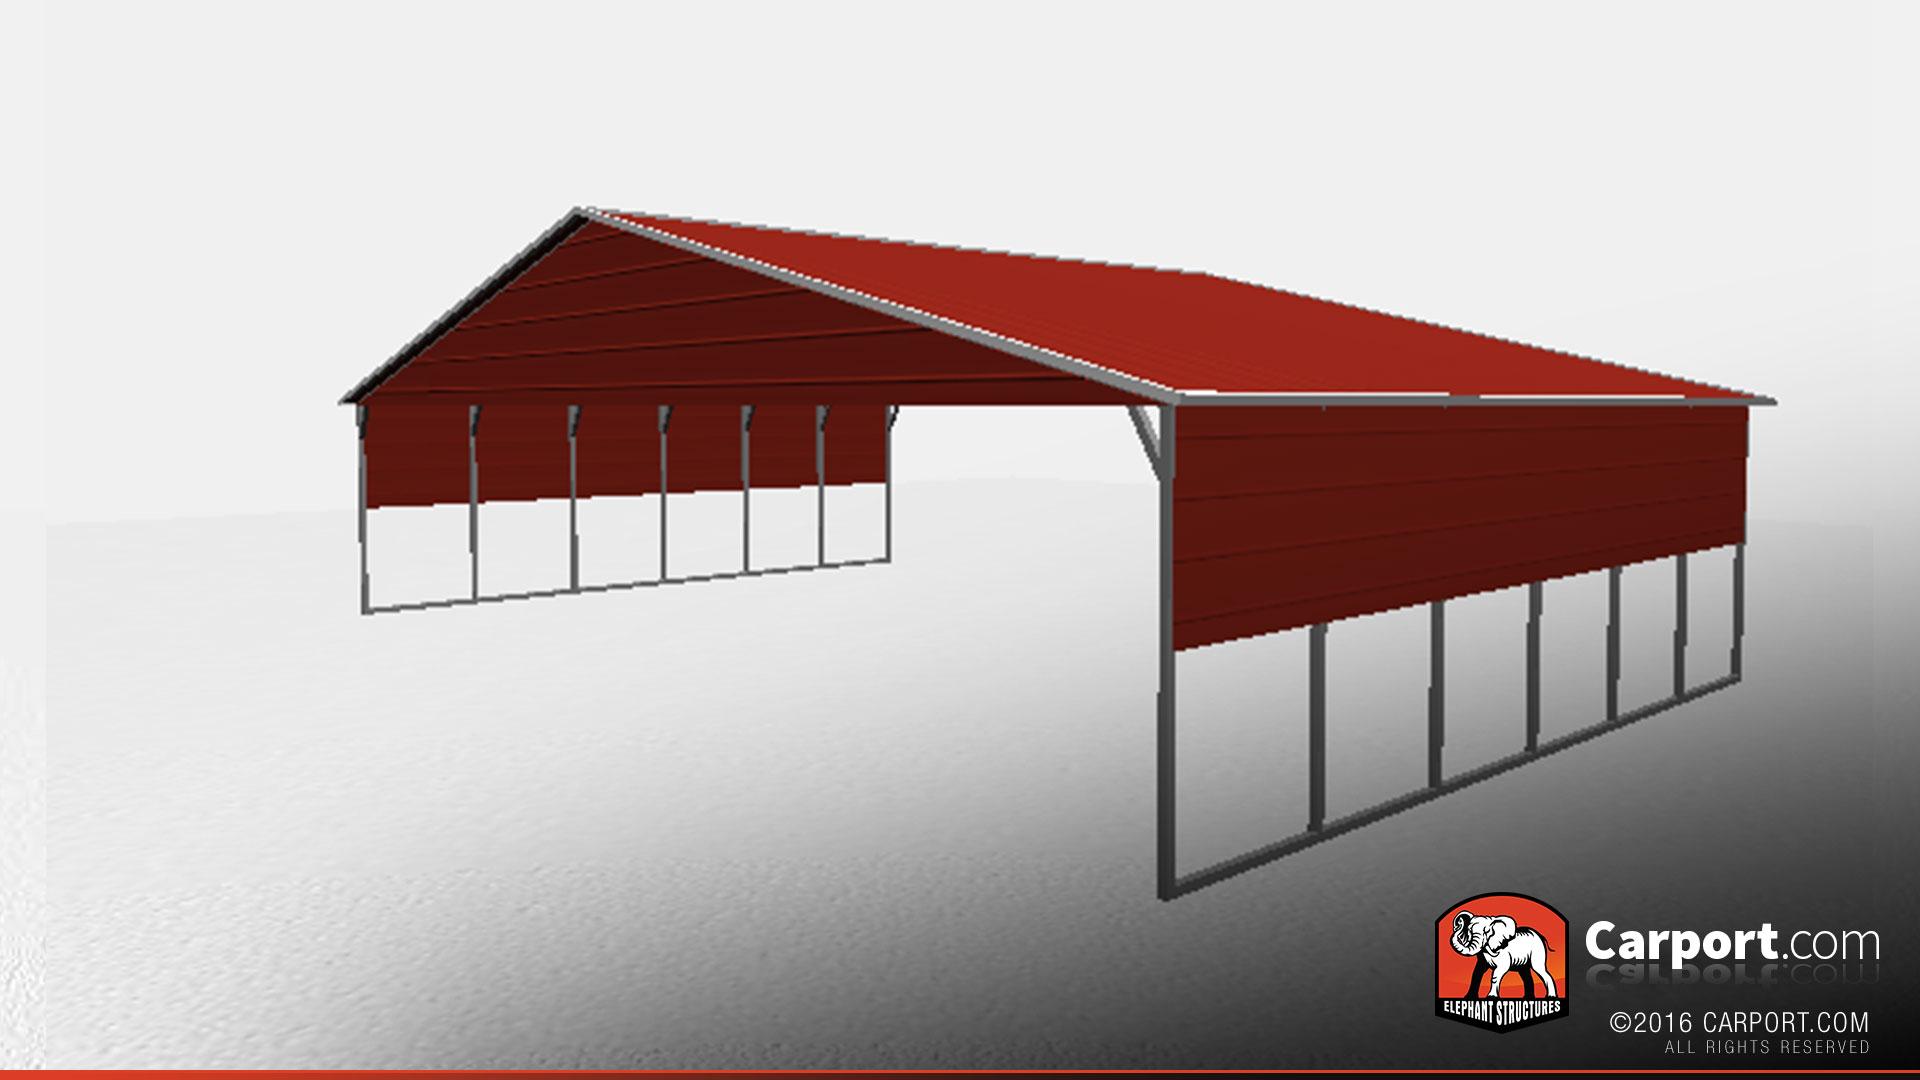 40 X 26 Vertical Roof Metal Carport With Side Panels Metal Carports Info